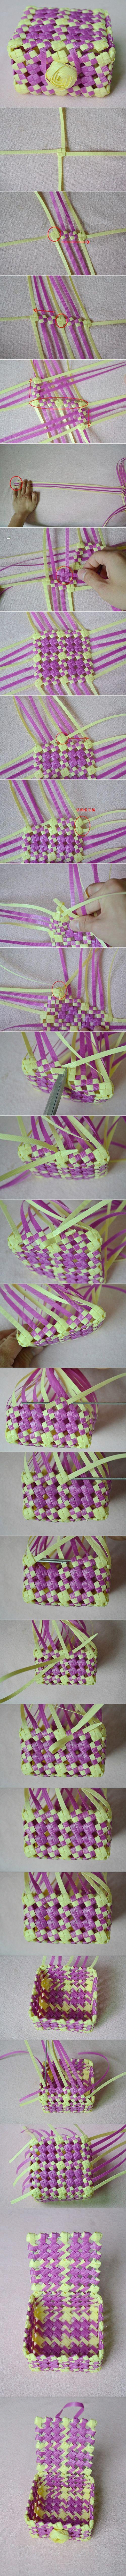 packing belt weaved basket tutorial